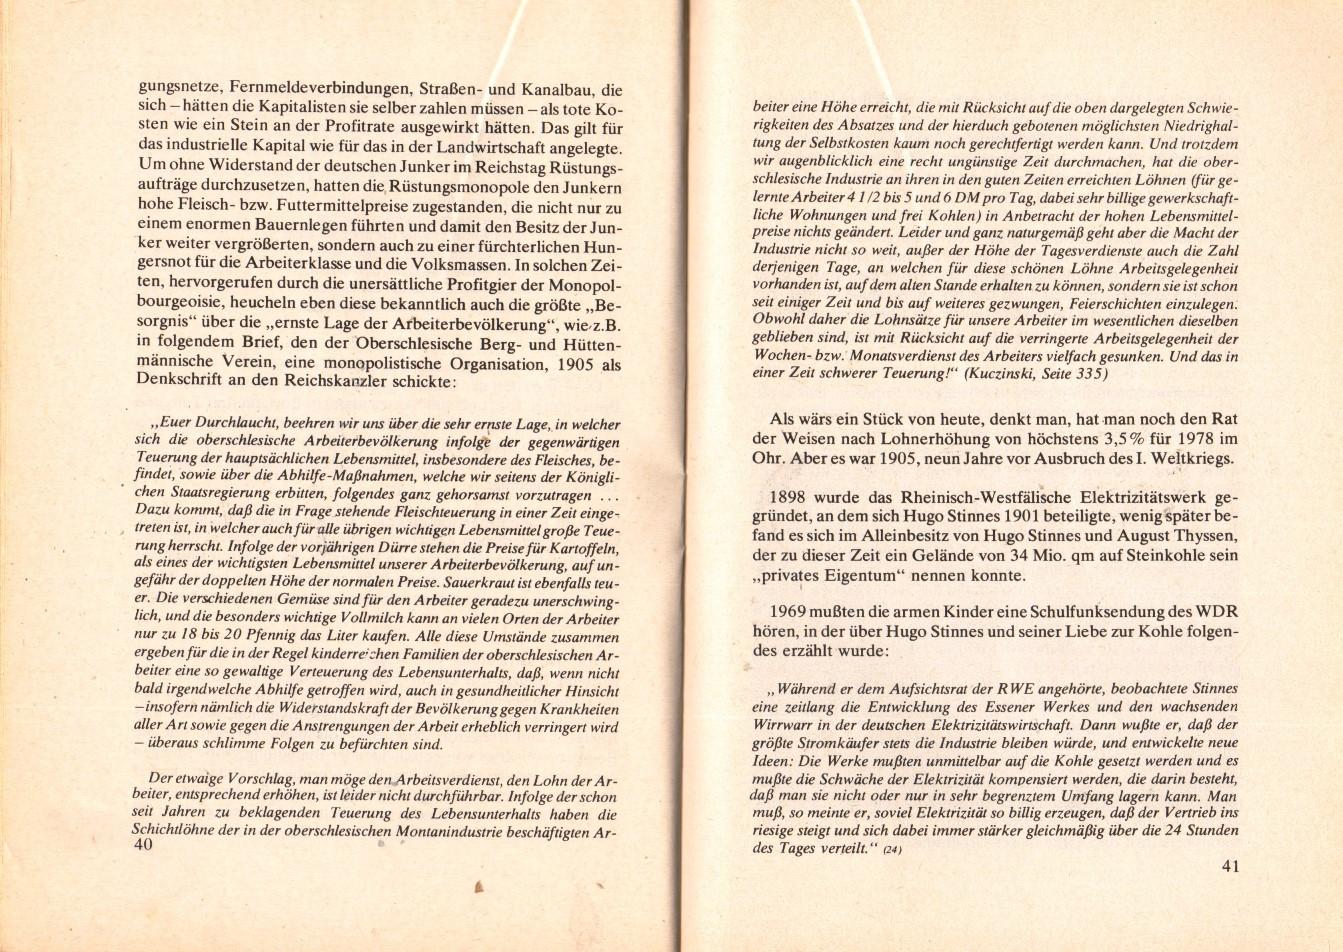 NRW_KBW_1977_Politik_der_Kohle_u_Stahlbarone_22